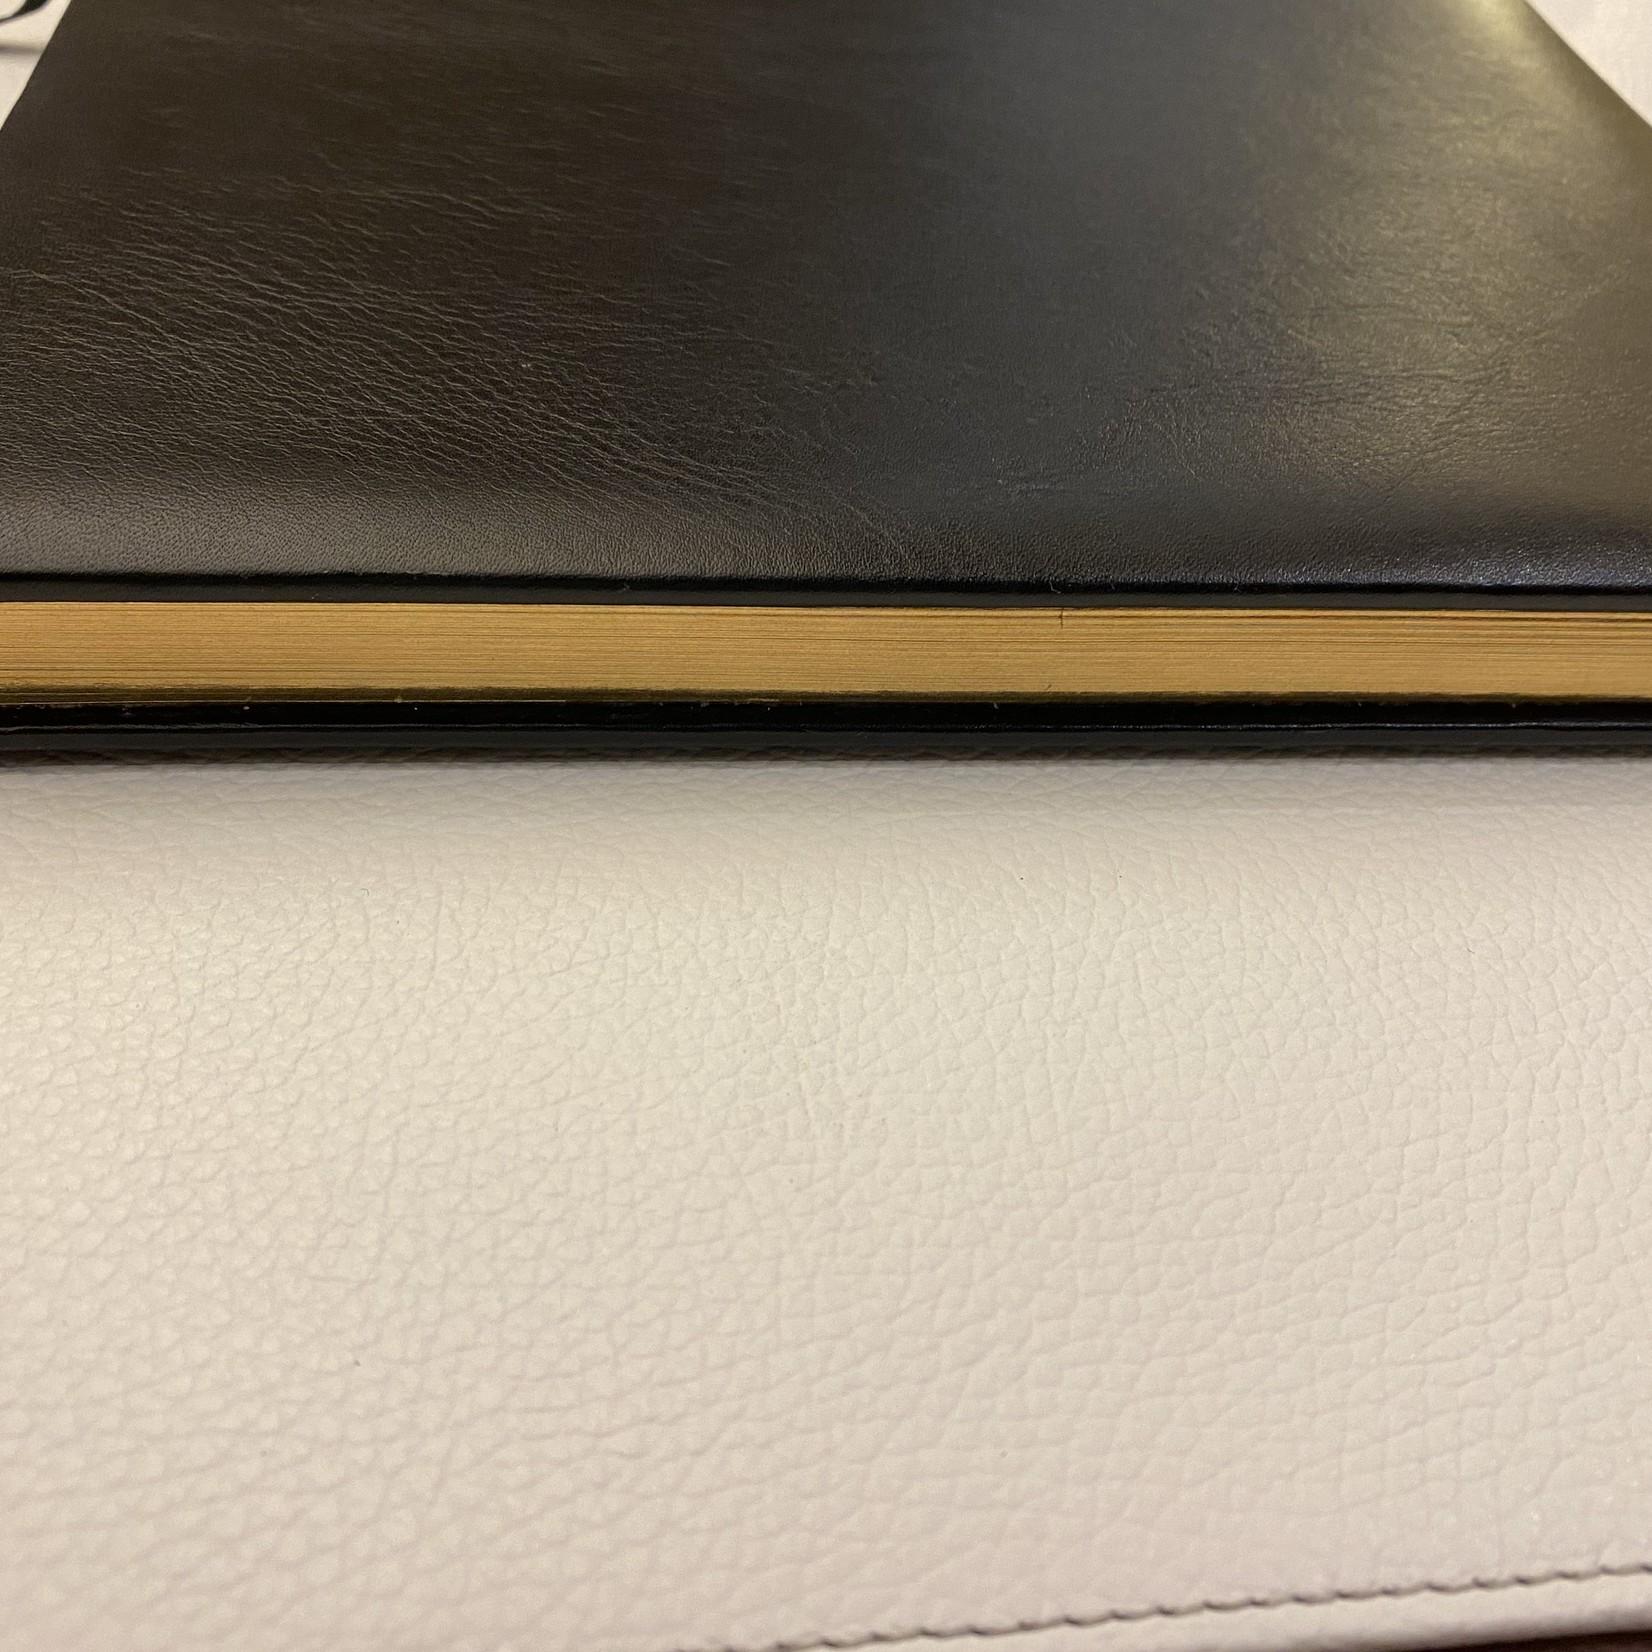 ASL - Akzente in Leder Kondolenzbuch, schwarzes Leder mit Goldschnitt